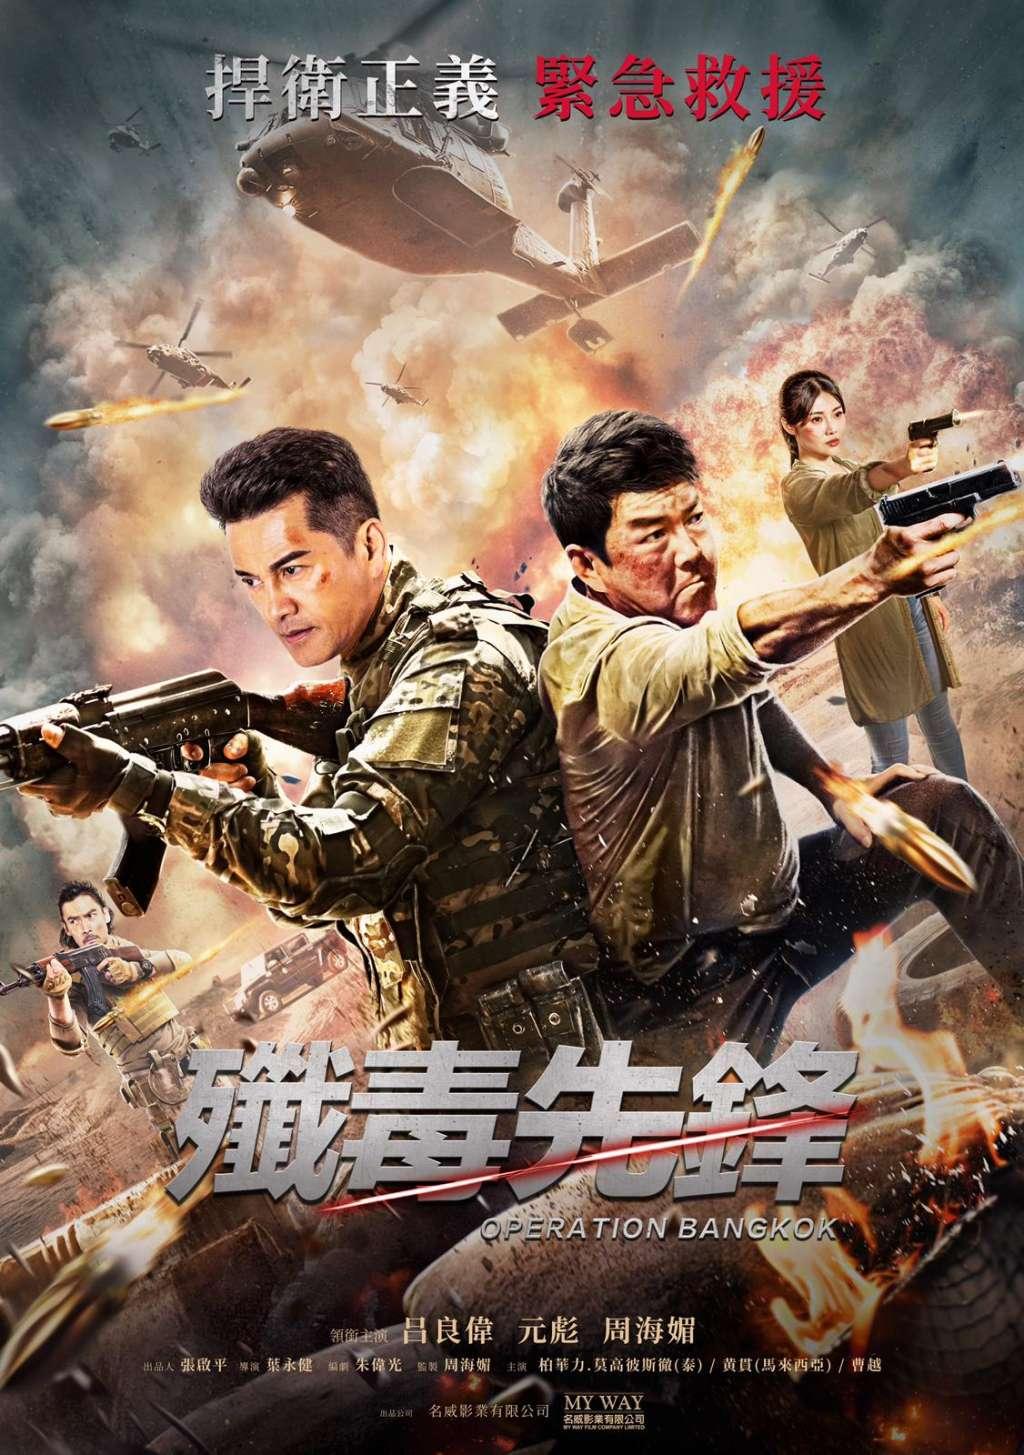 Operation Bangkok (a.k.a. Heroes Return) kapak